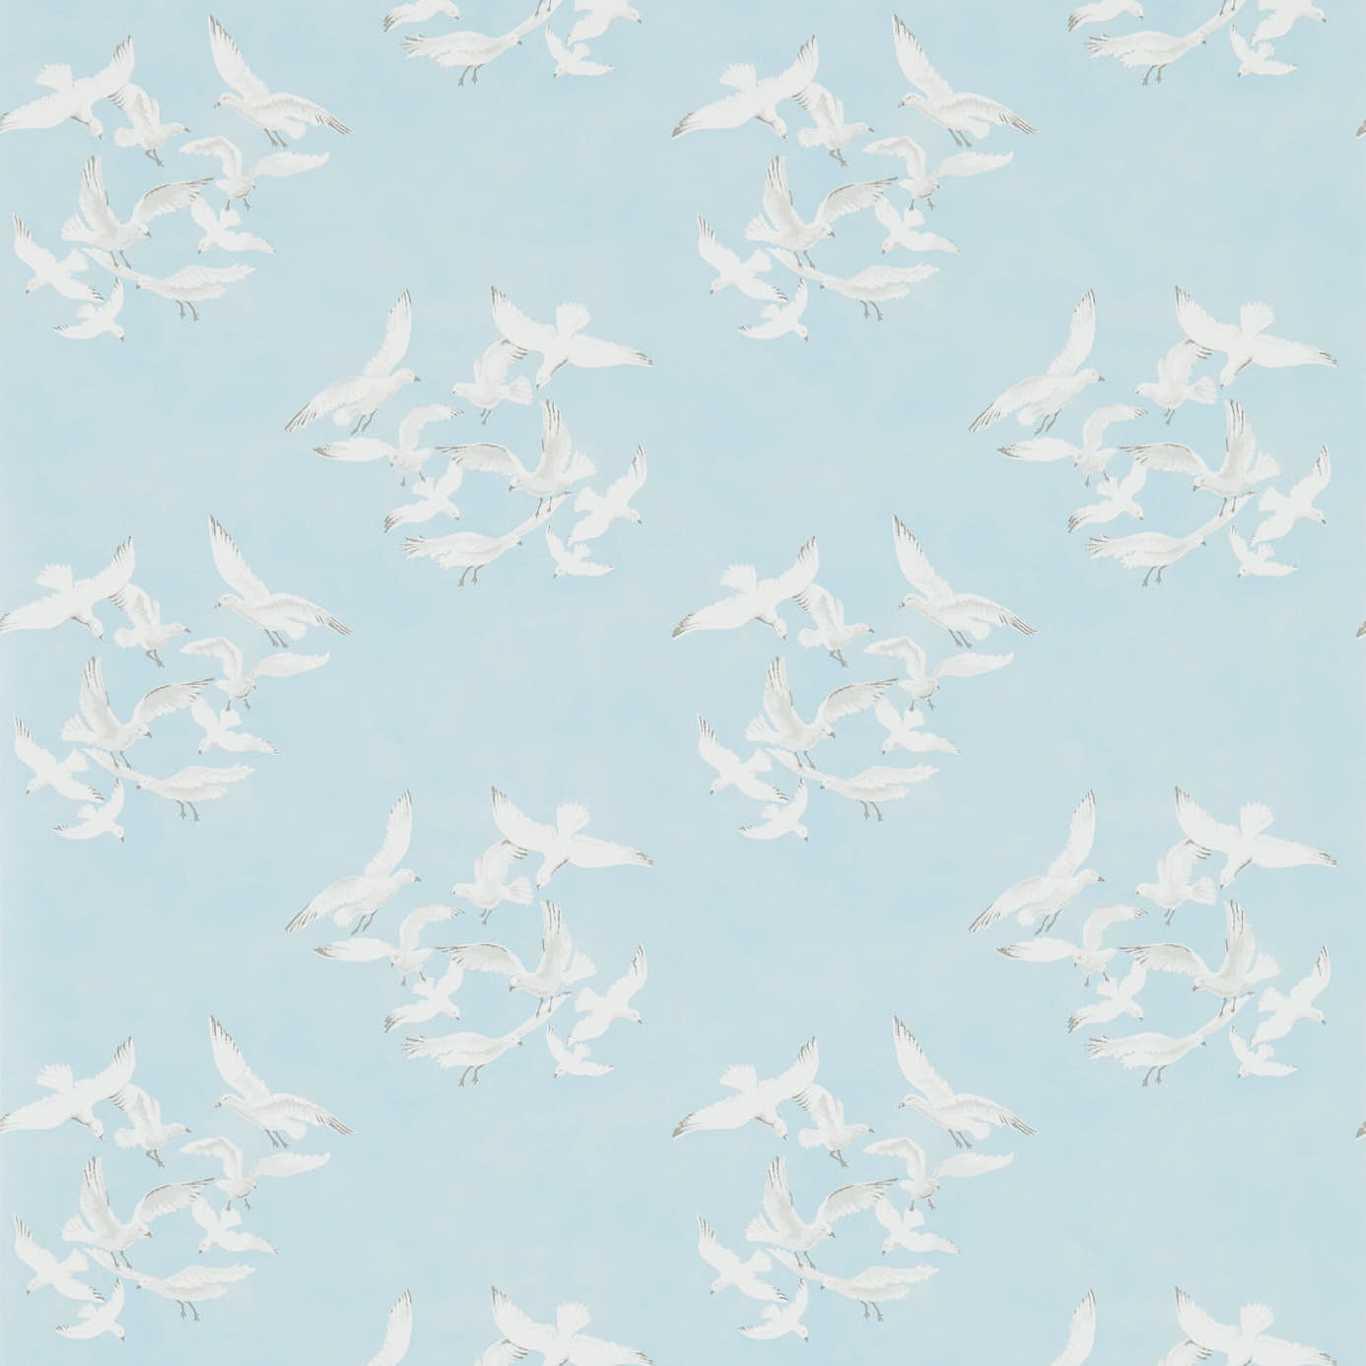 Seagulls by SAN